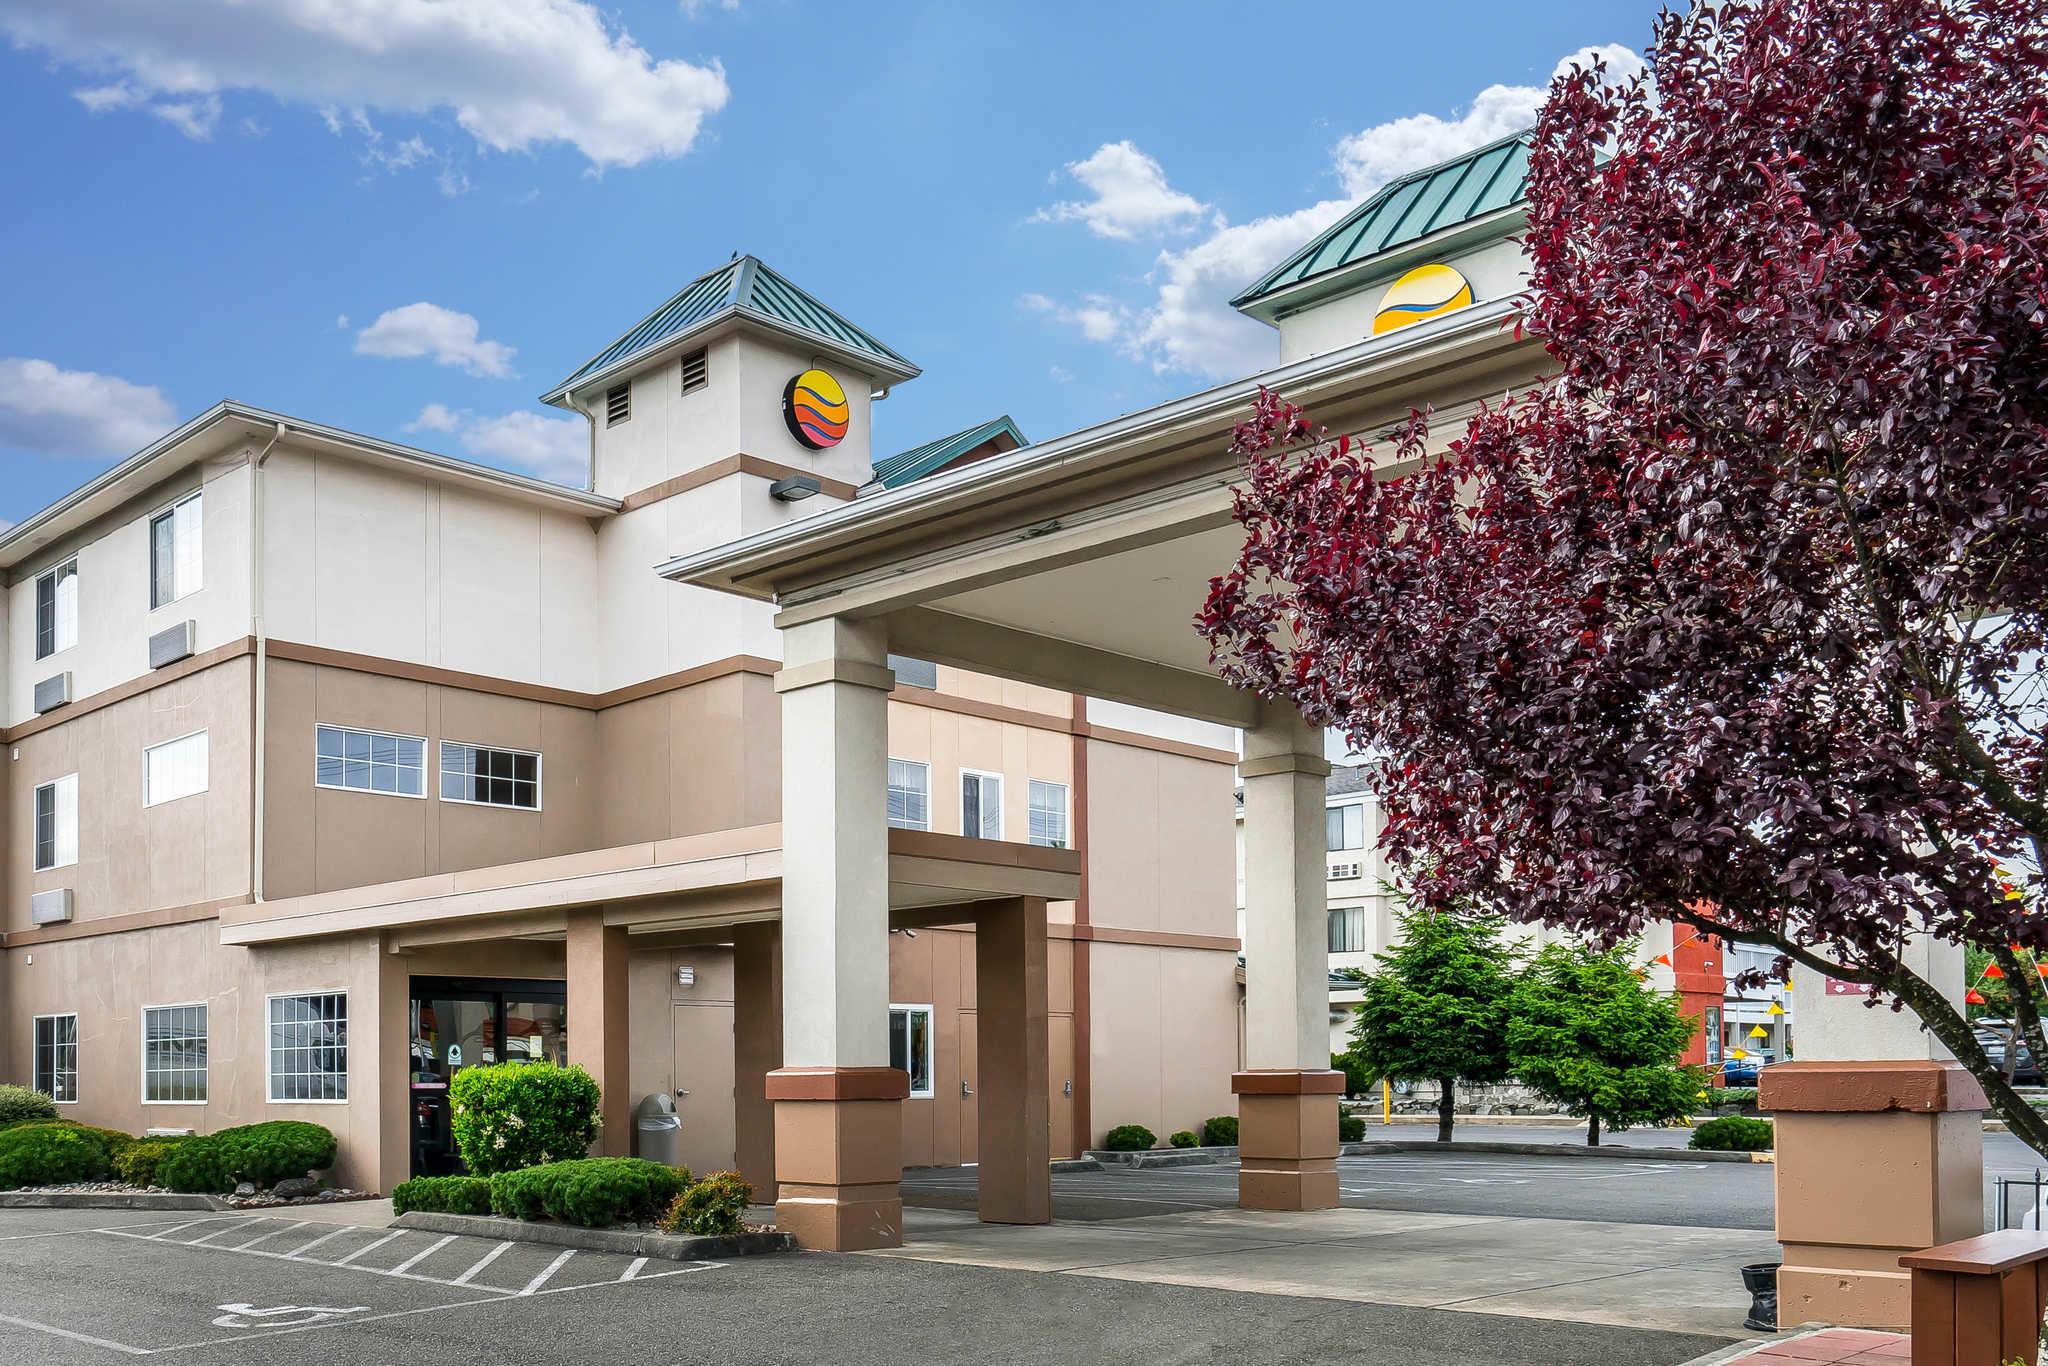 Tacoma Hotels Near Tacoma Dome